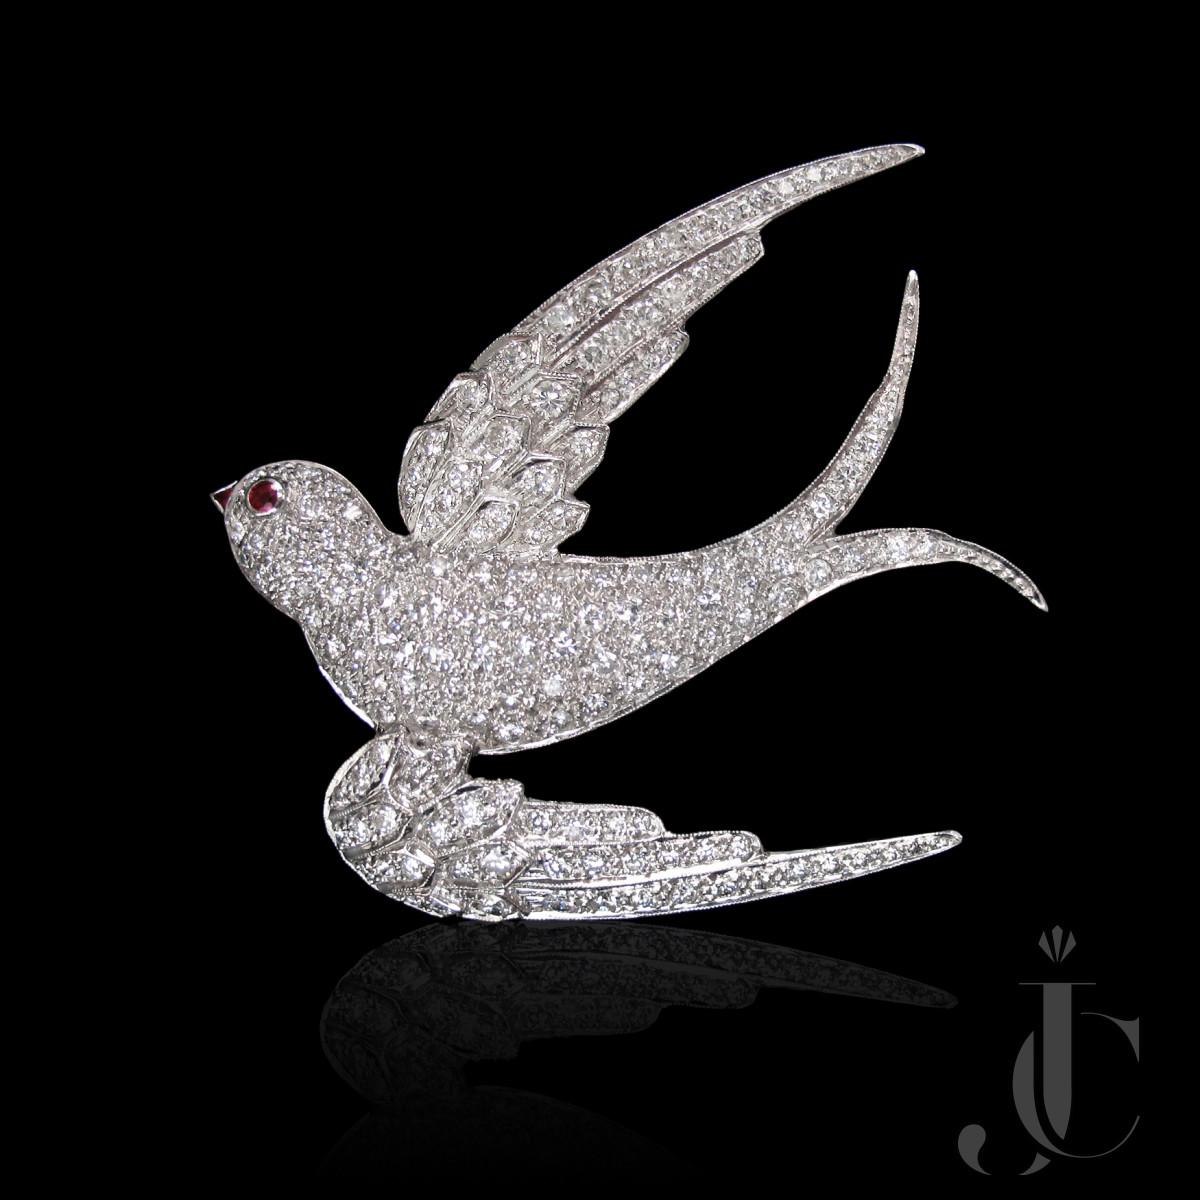 Platinum Diamond Bird Brooch with Ruby accents, circa 1955